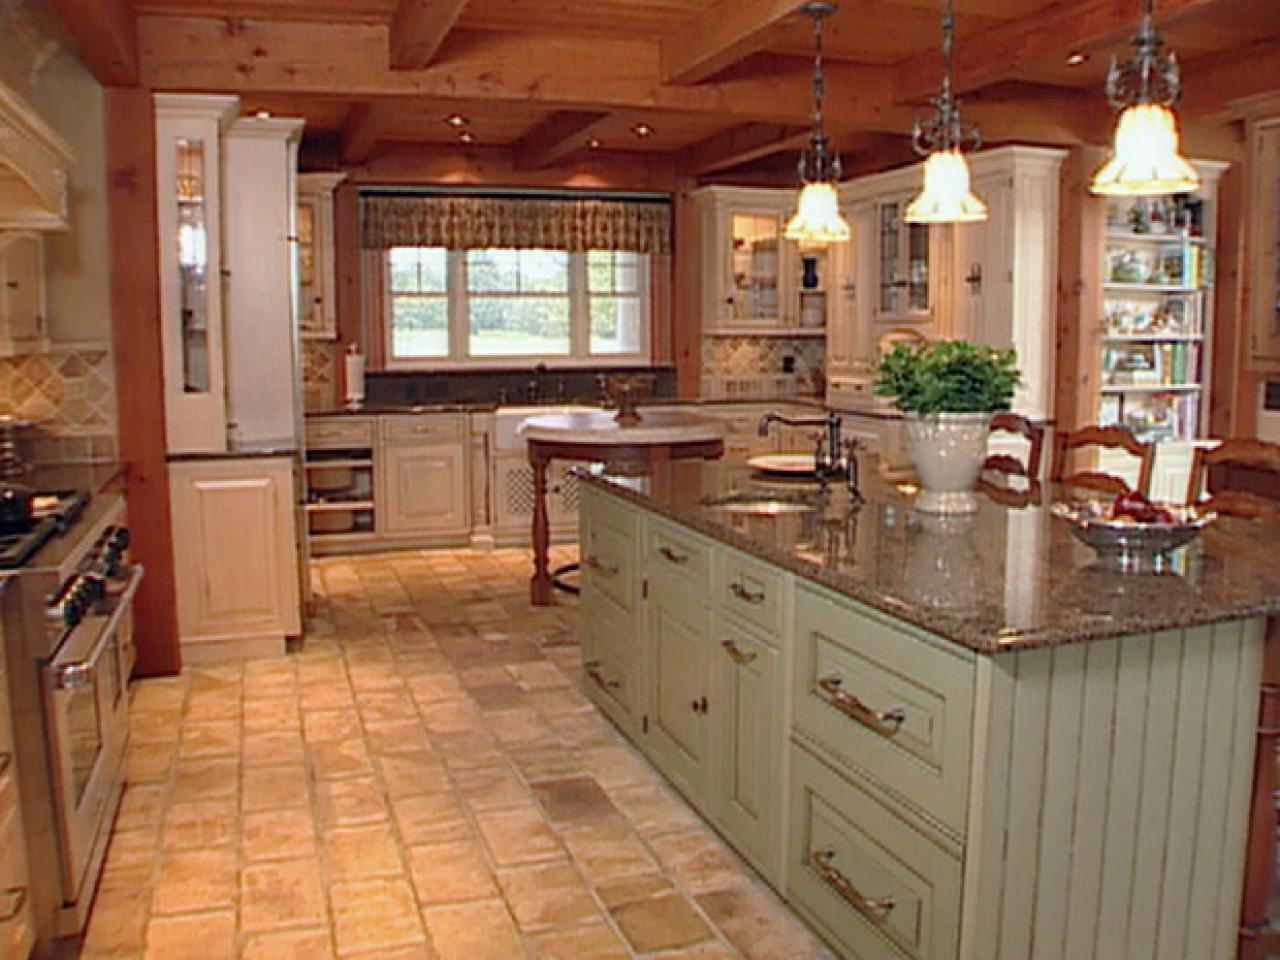 Older Home Kitchen Remodeling Ideas | Roy Home Design on Kitchen Remodel Ideas  id=37487